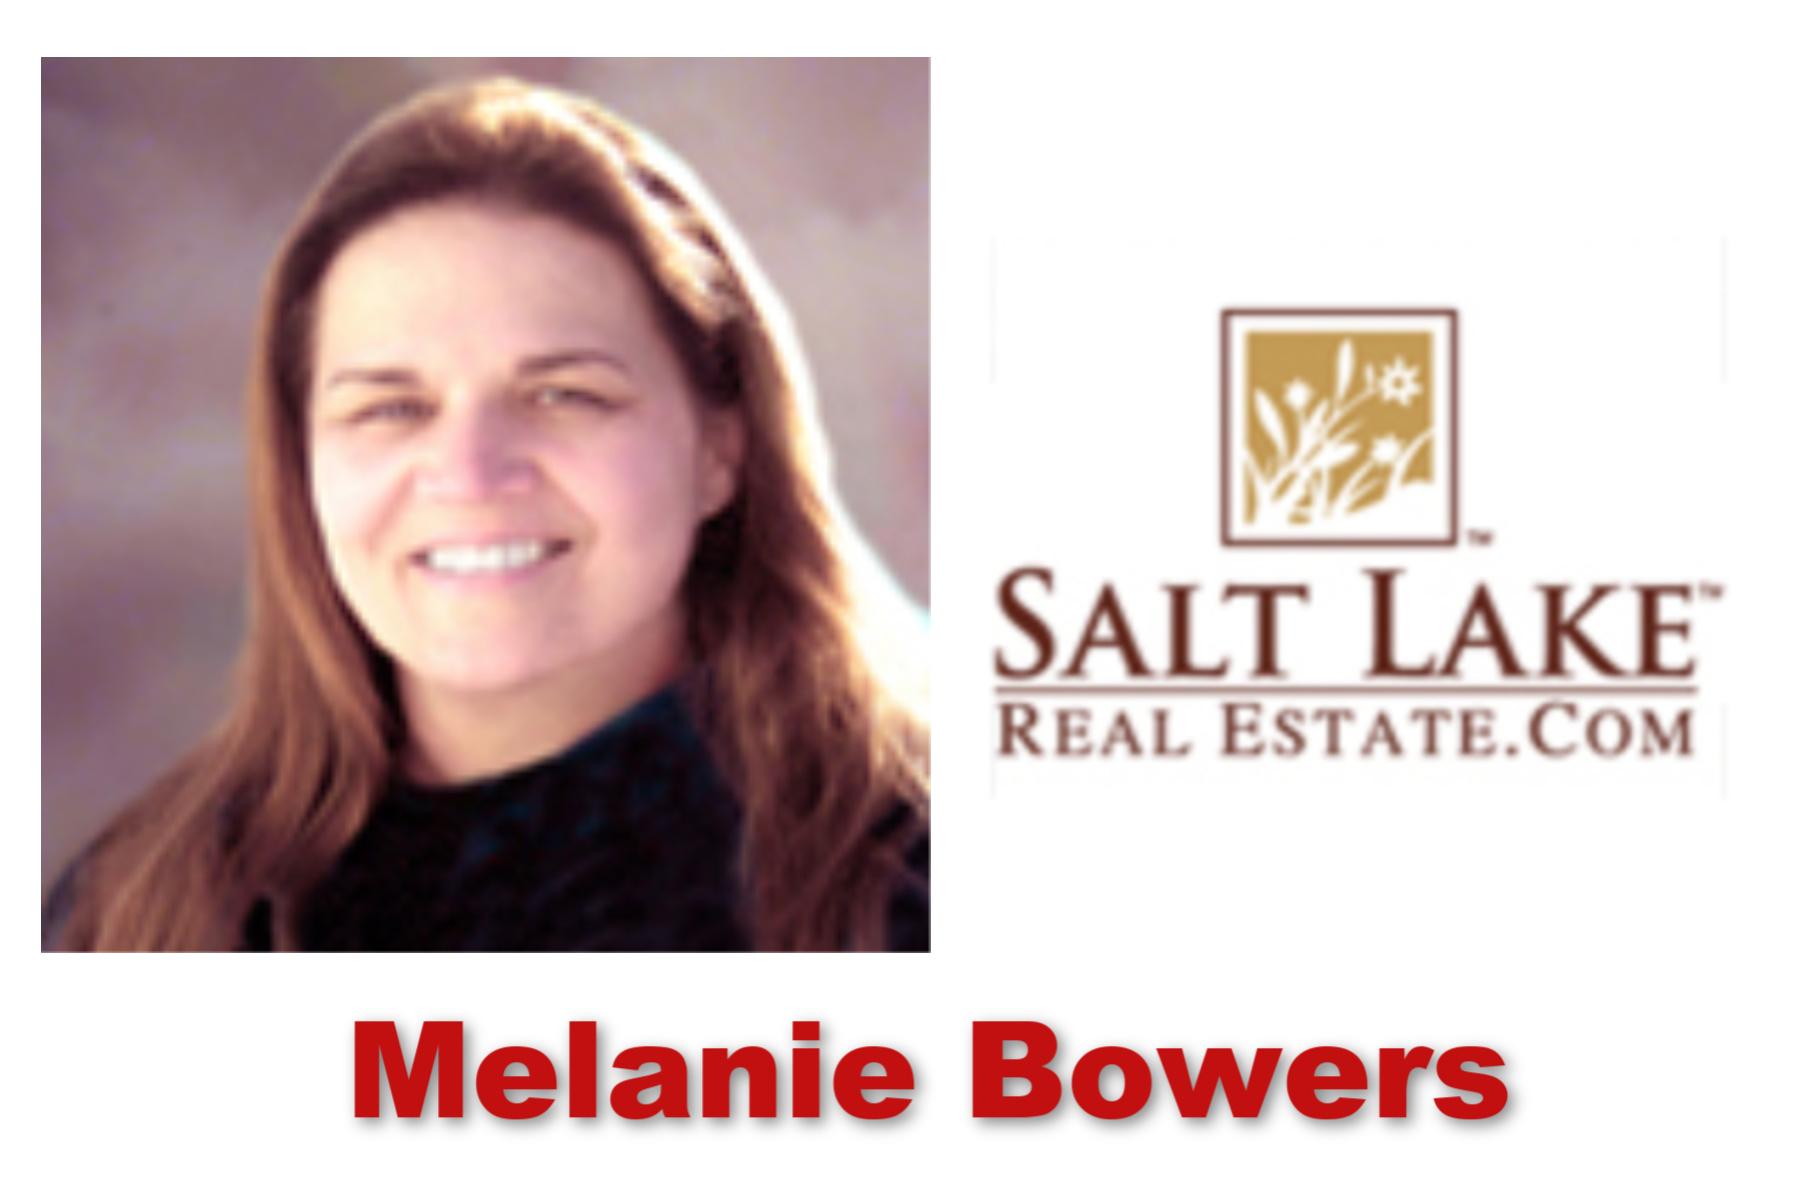 Melanie Bowers